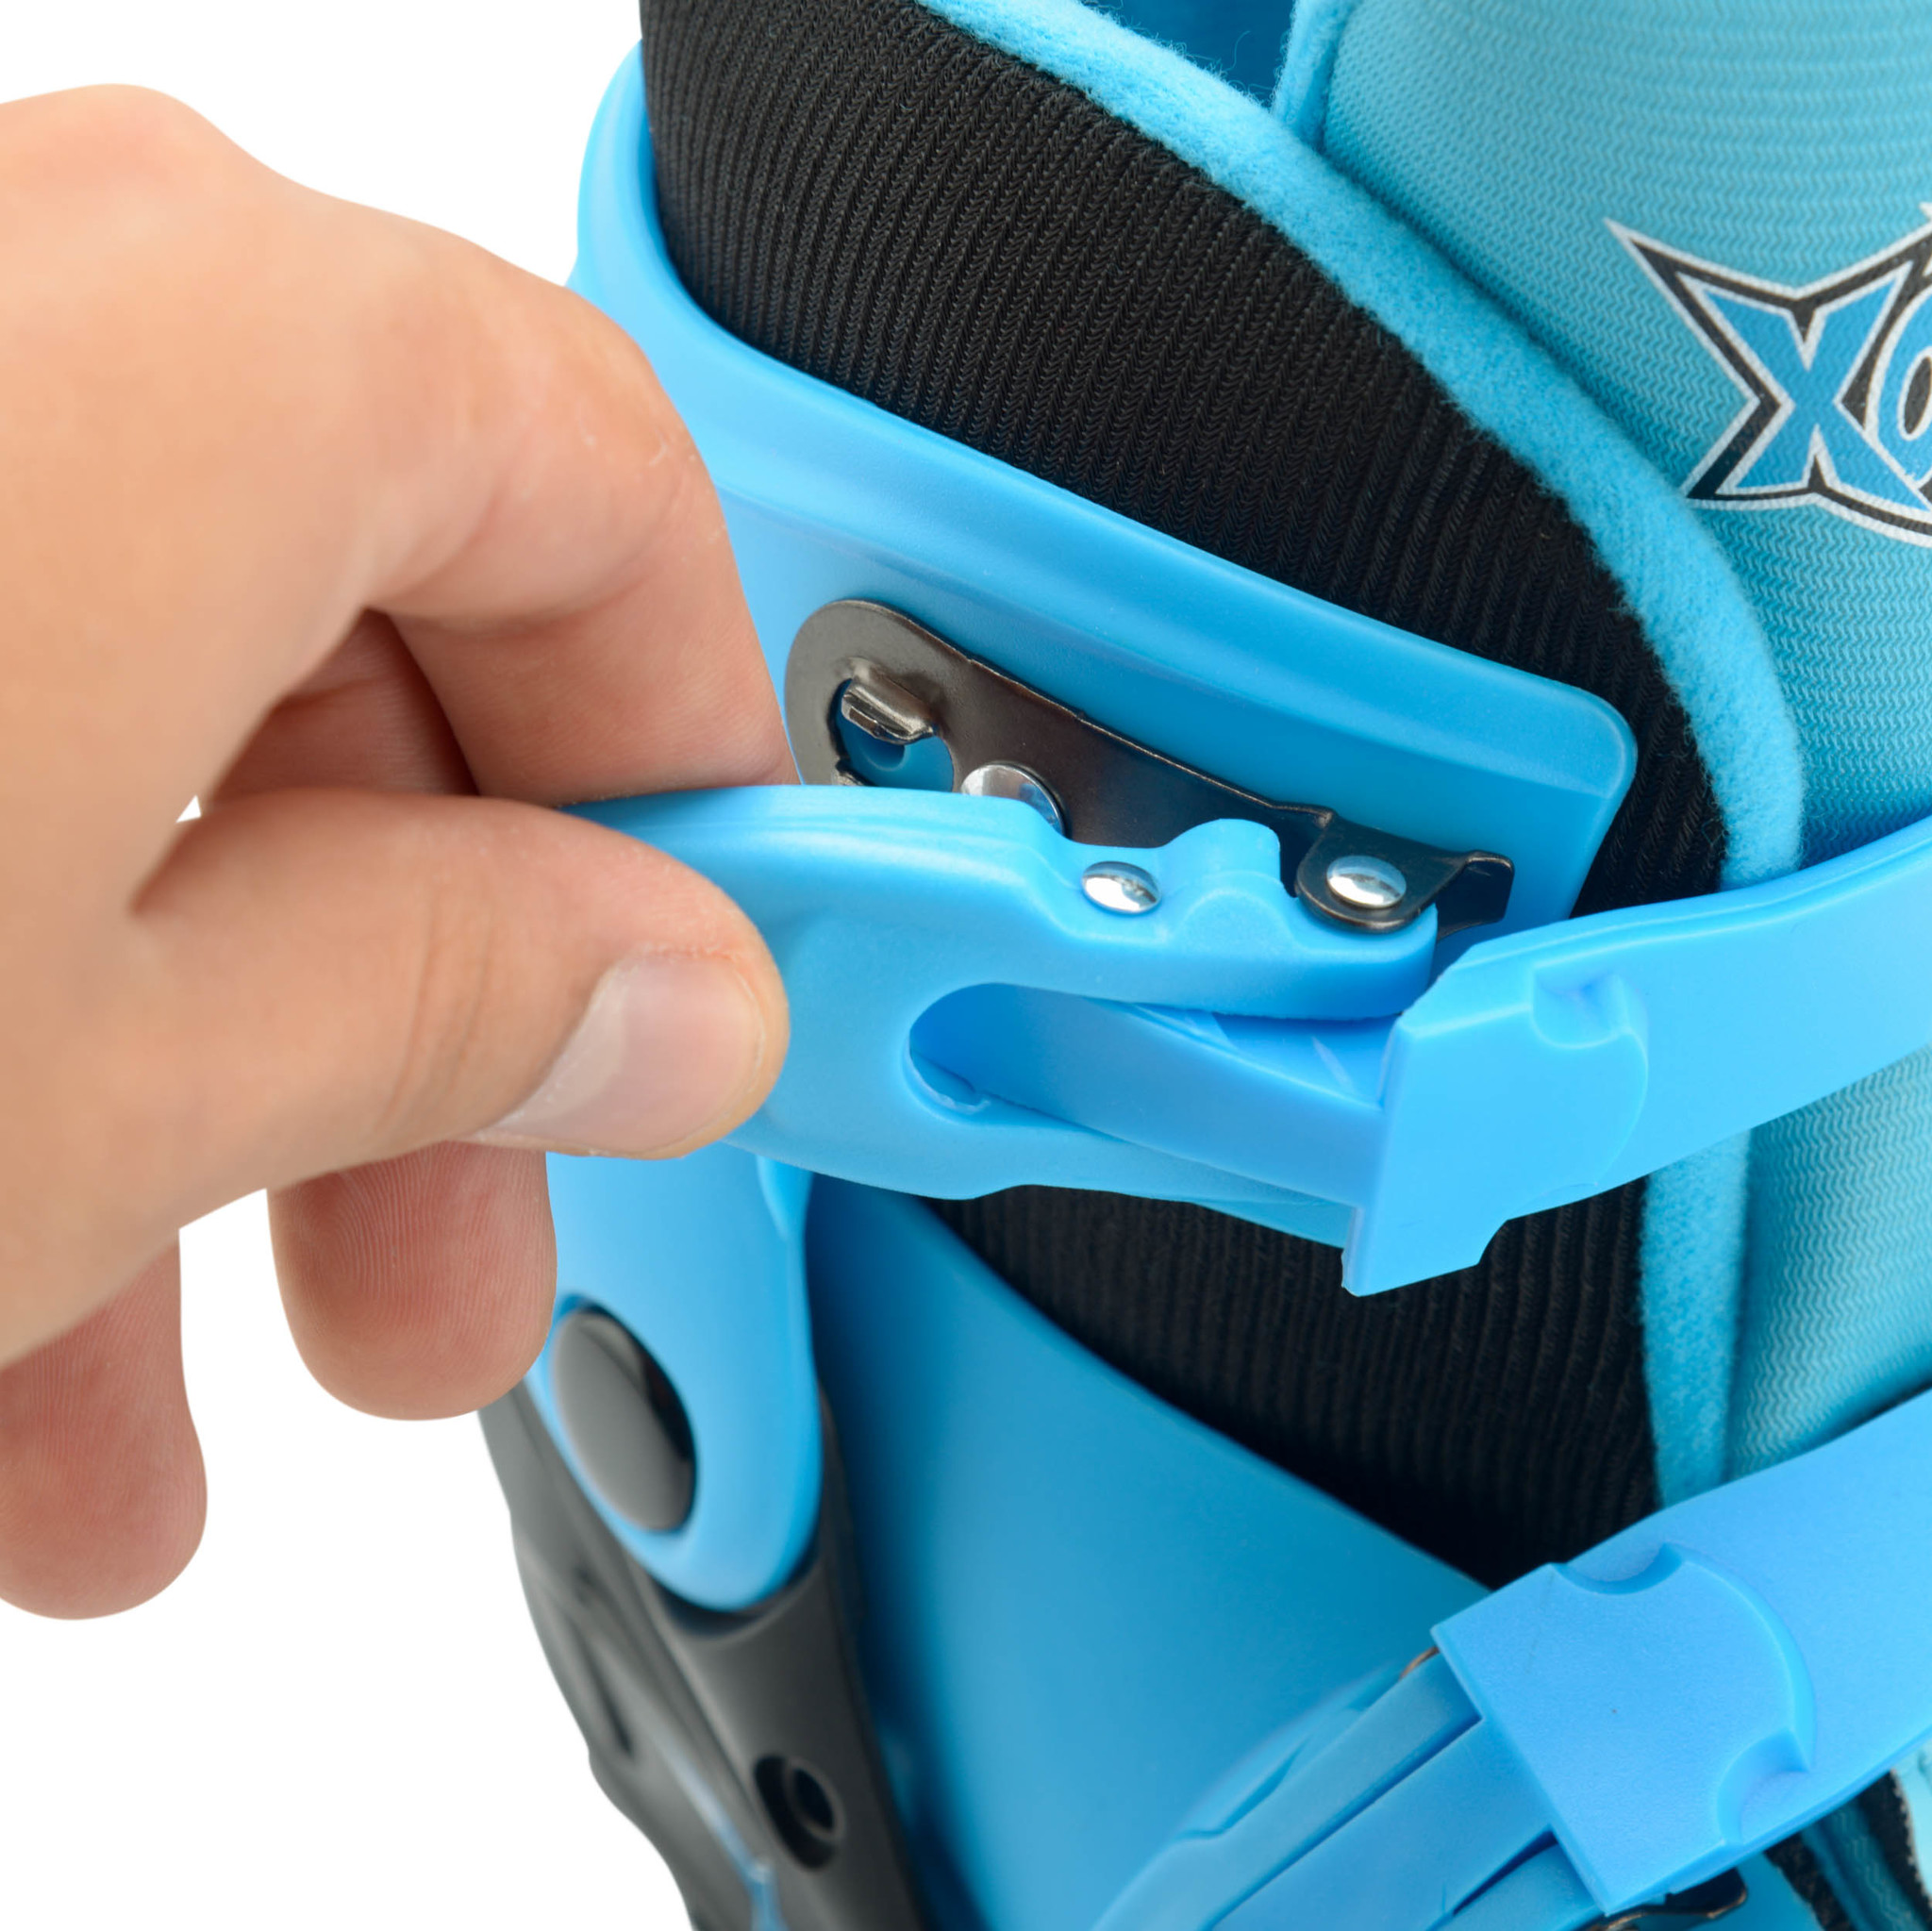 ролики TY6064 xootz quad skates blue